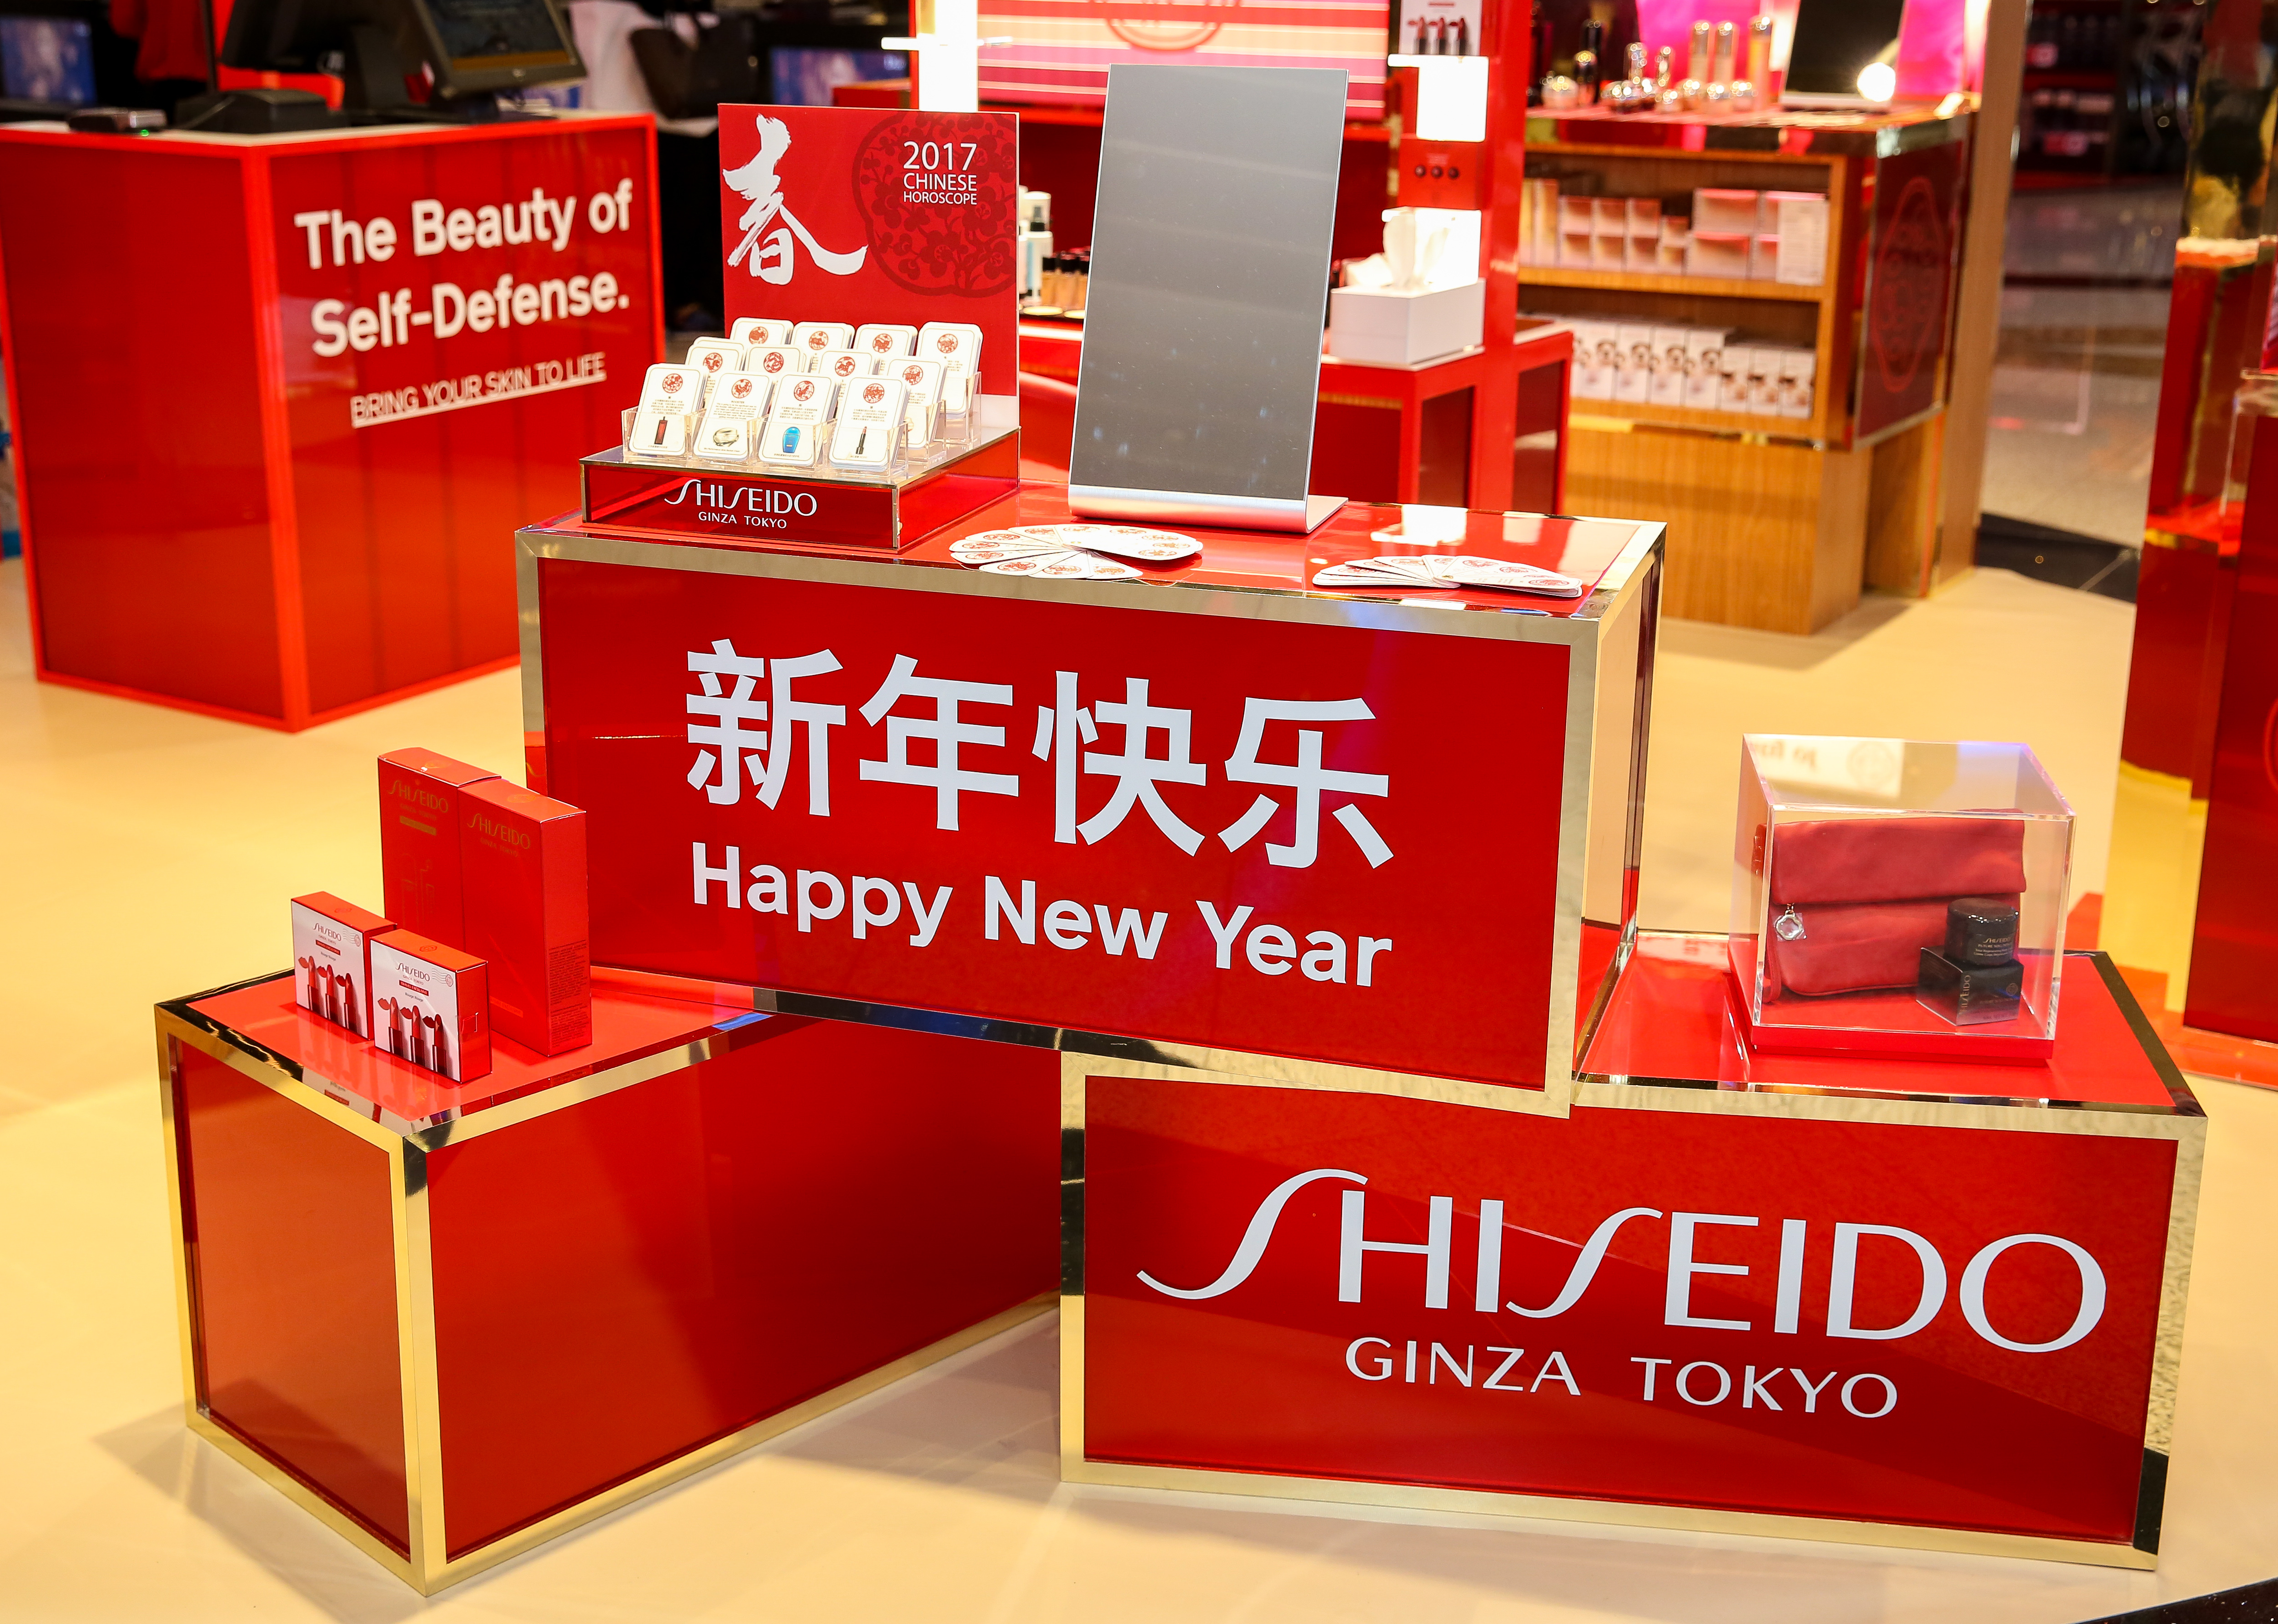 Shiseido Marketing in China